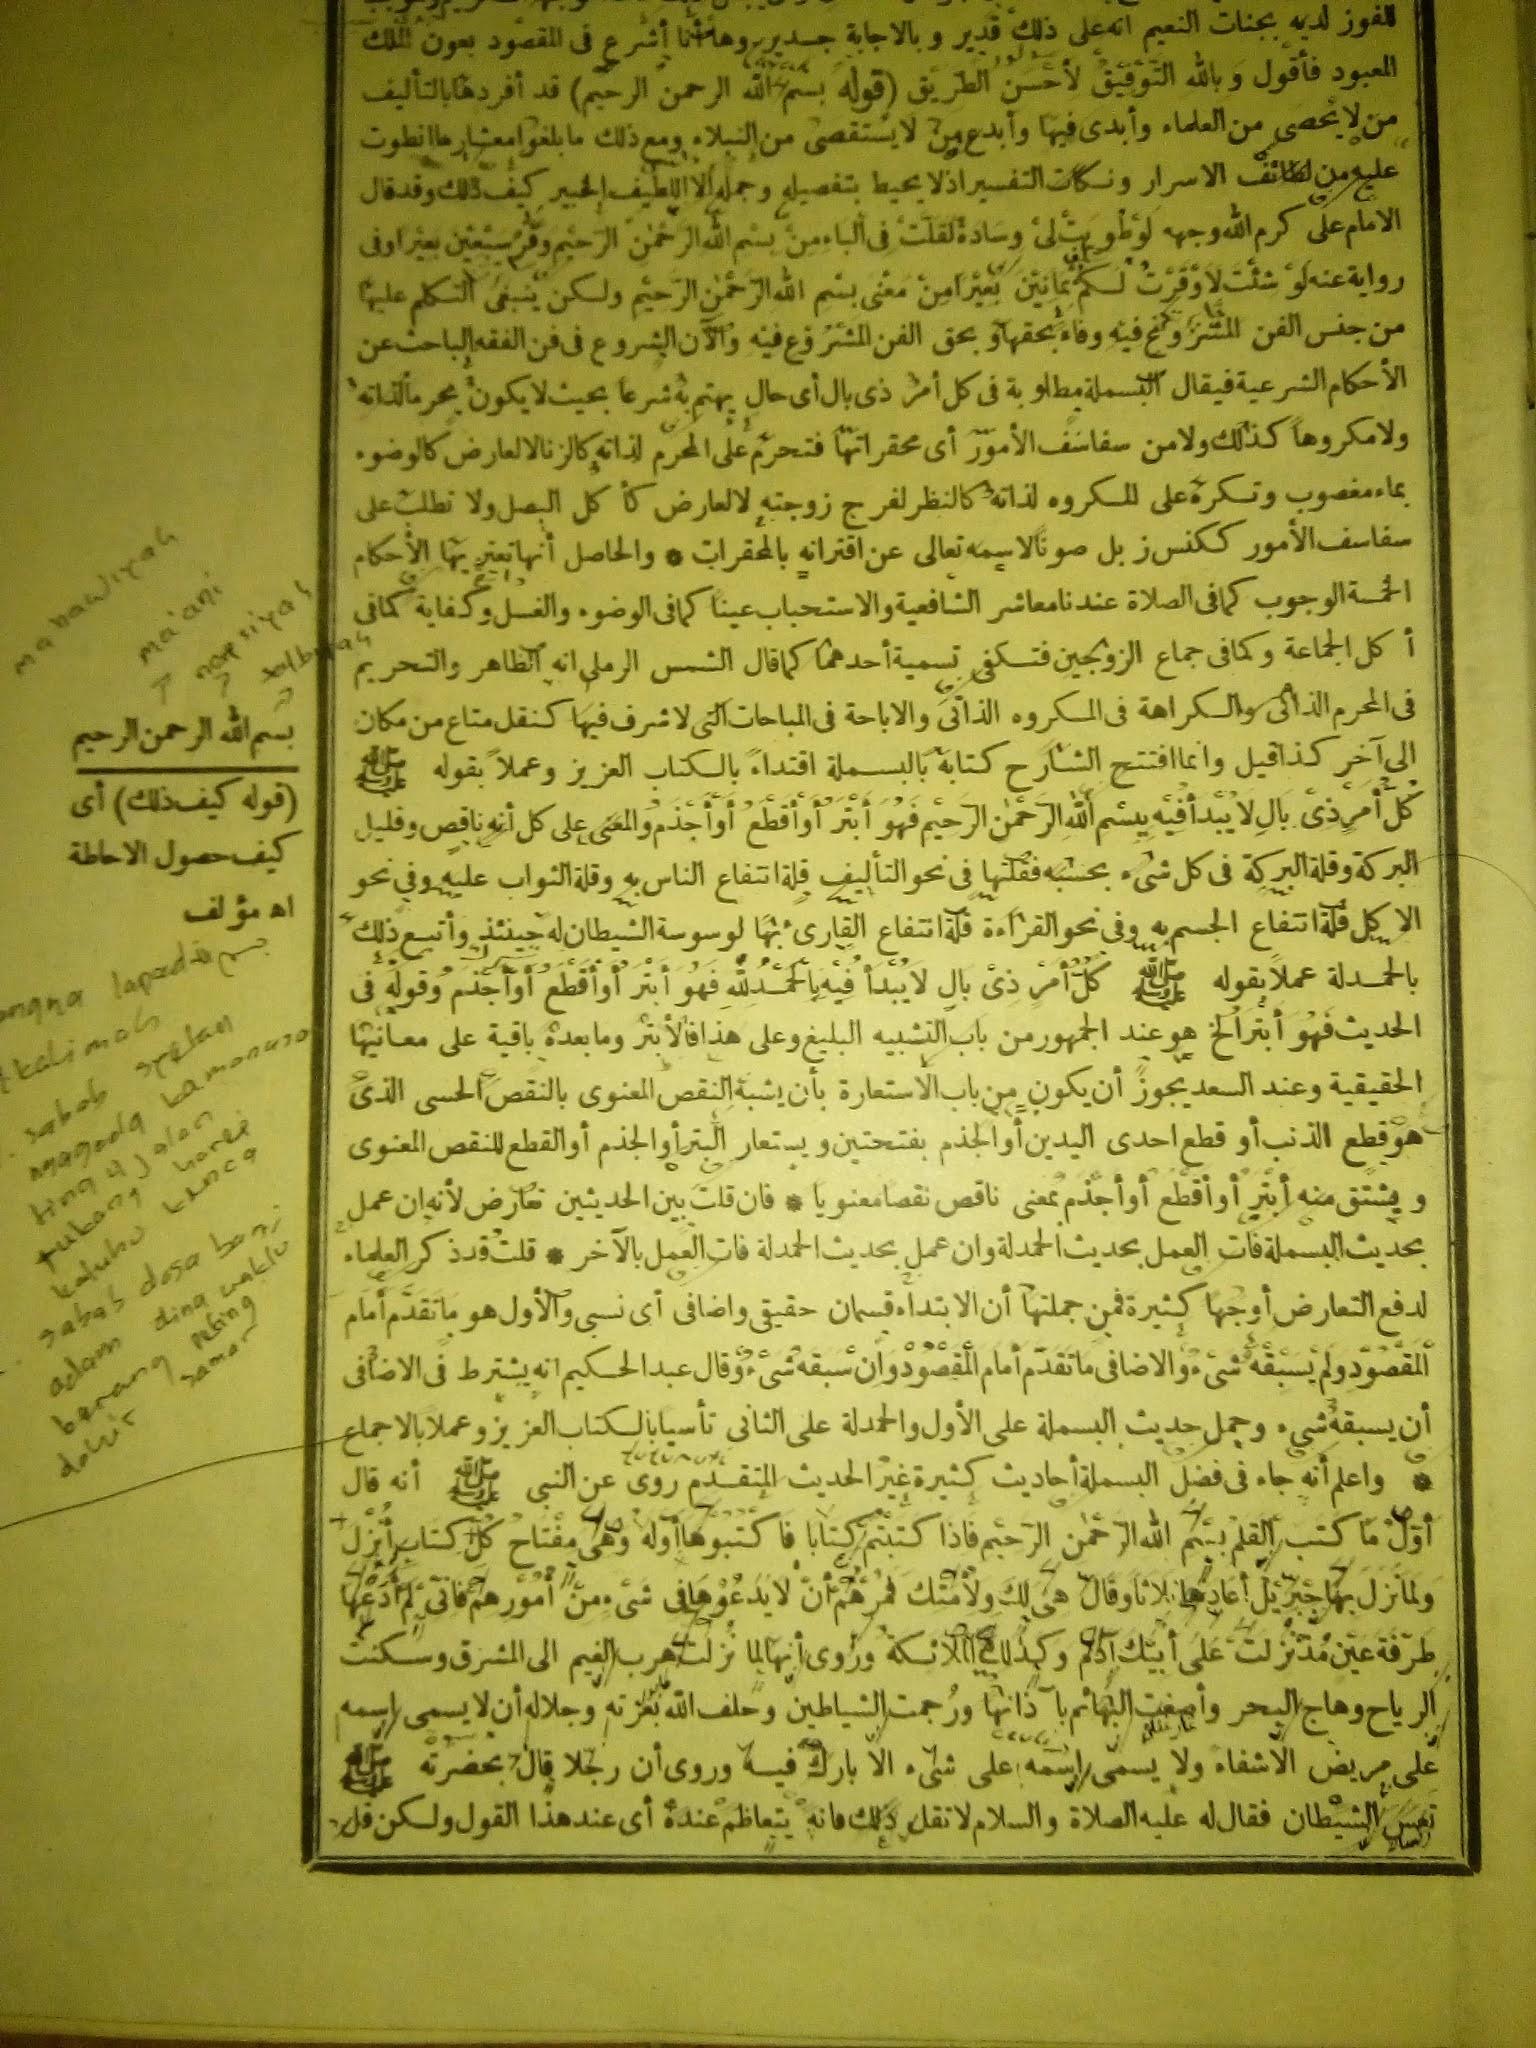 basmalah-menurut-ilmu-fiqih-ianah-ath-thalibin